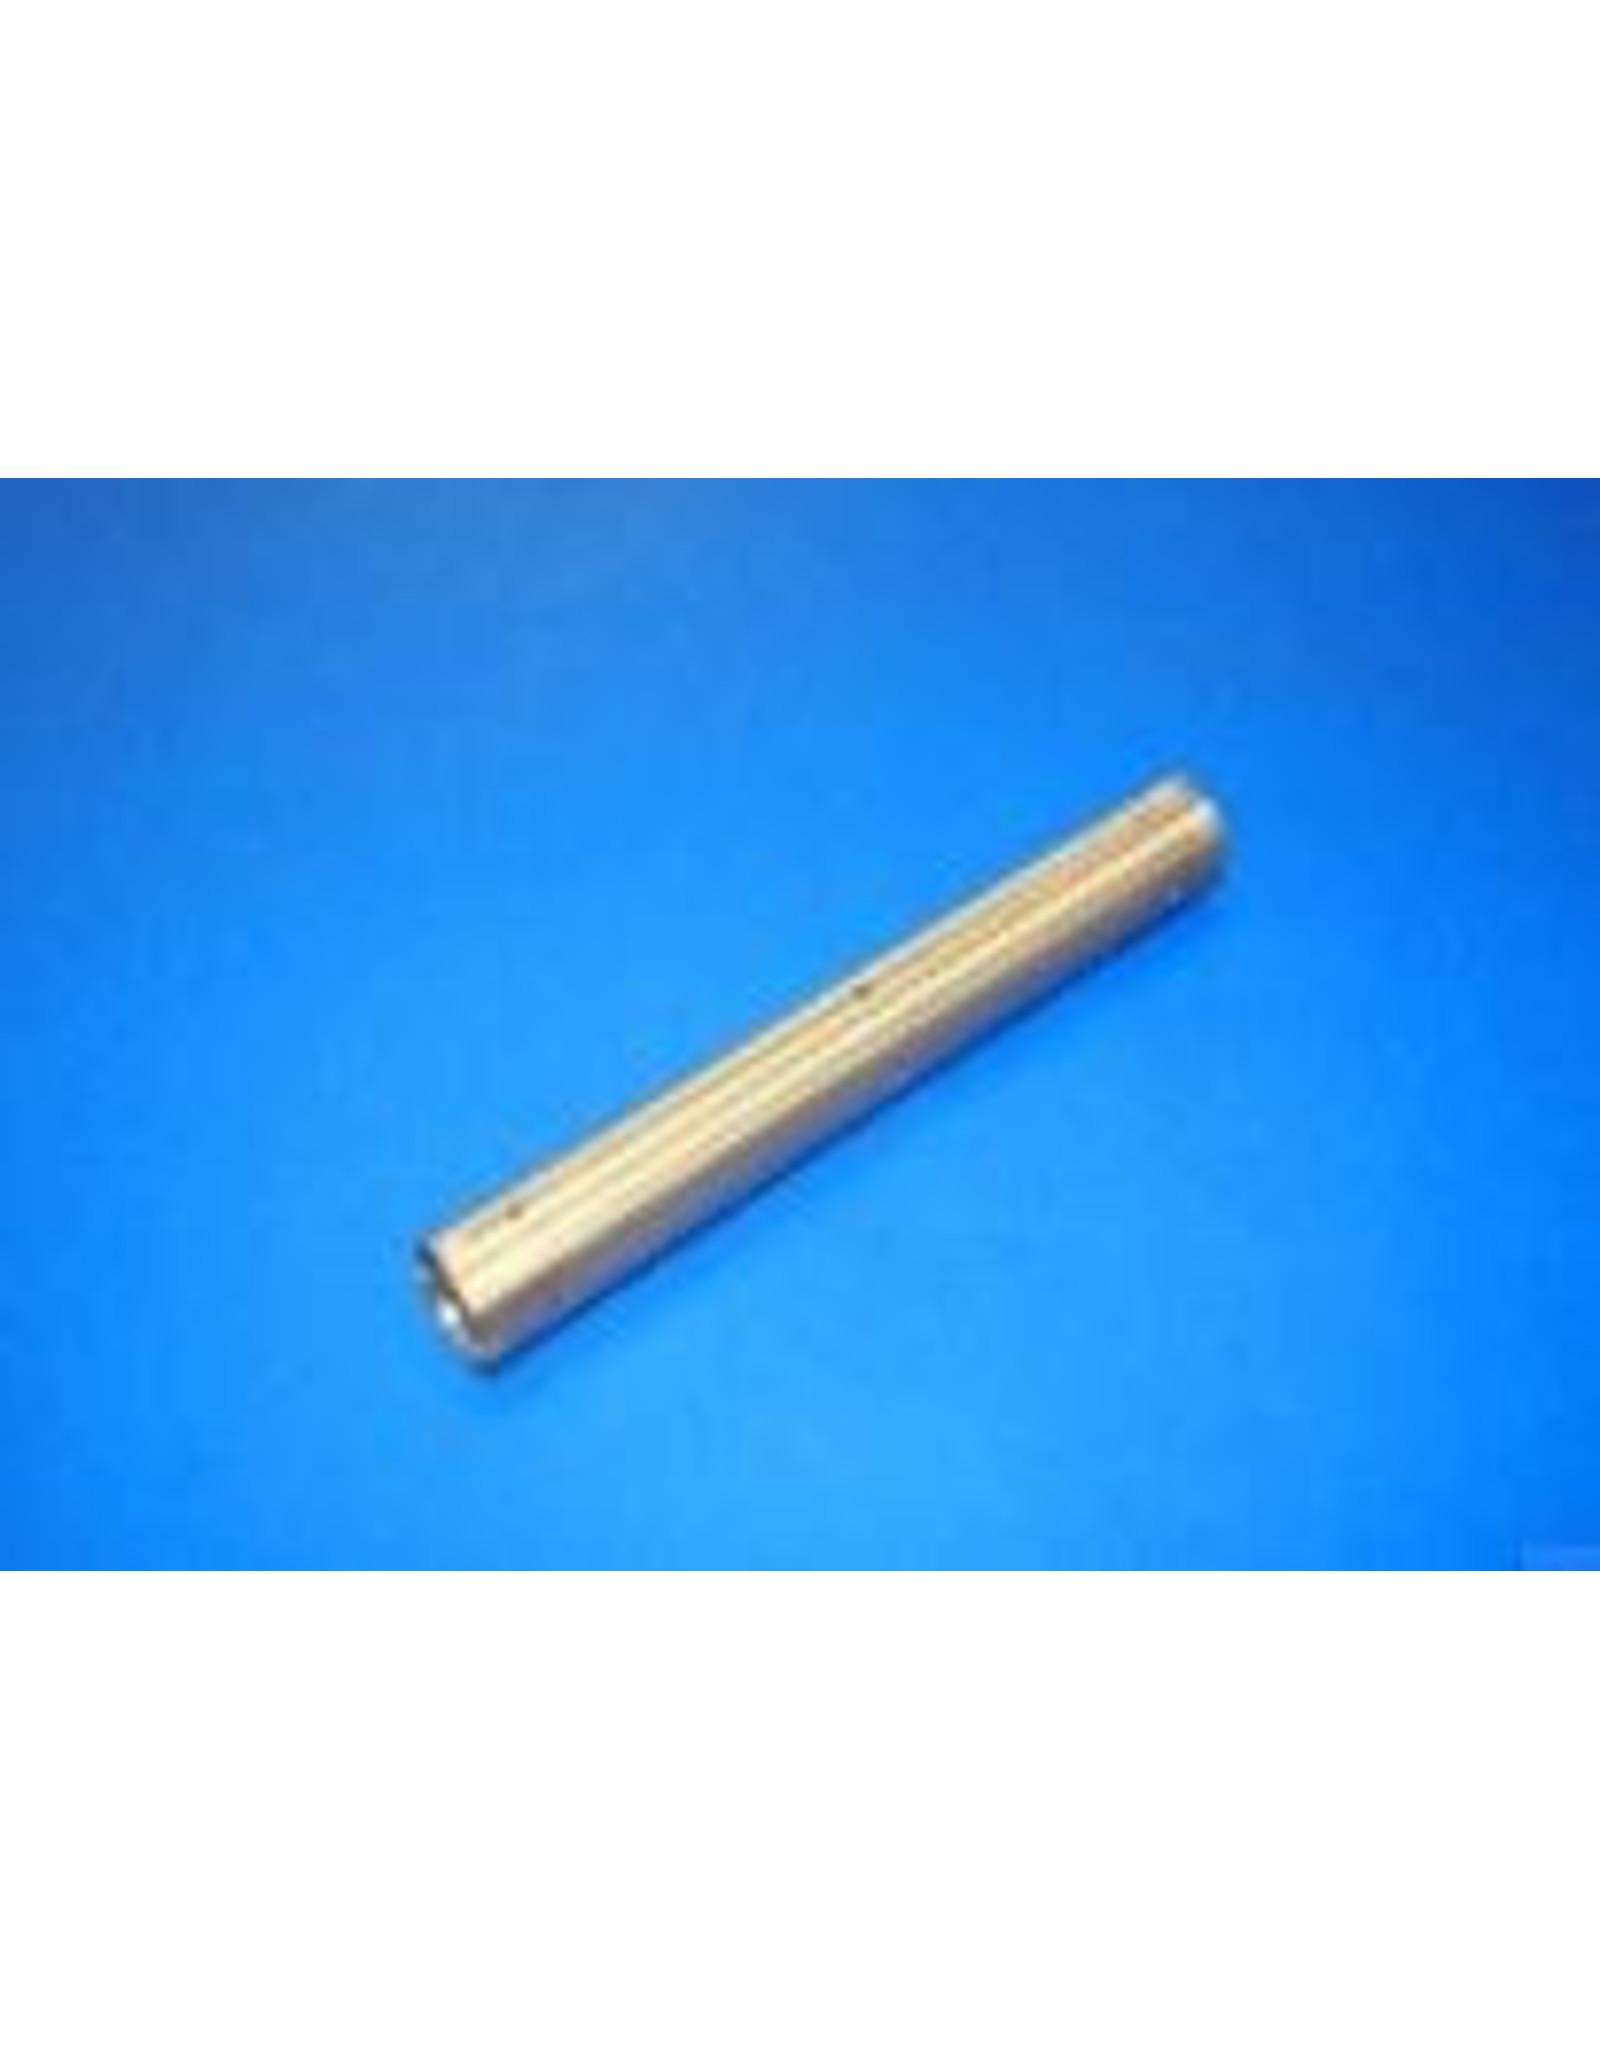 KMT Style Cylinder Spacer, HP Cylinder, SL5, Brass, Single Inlet